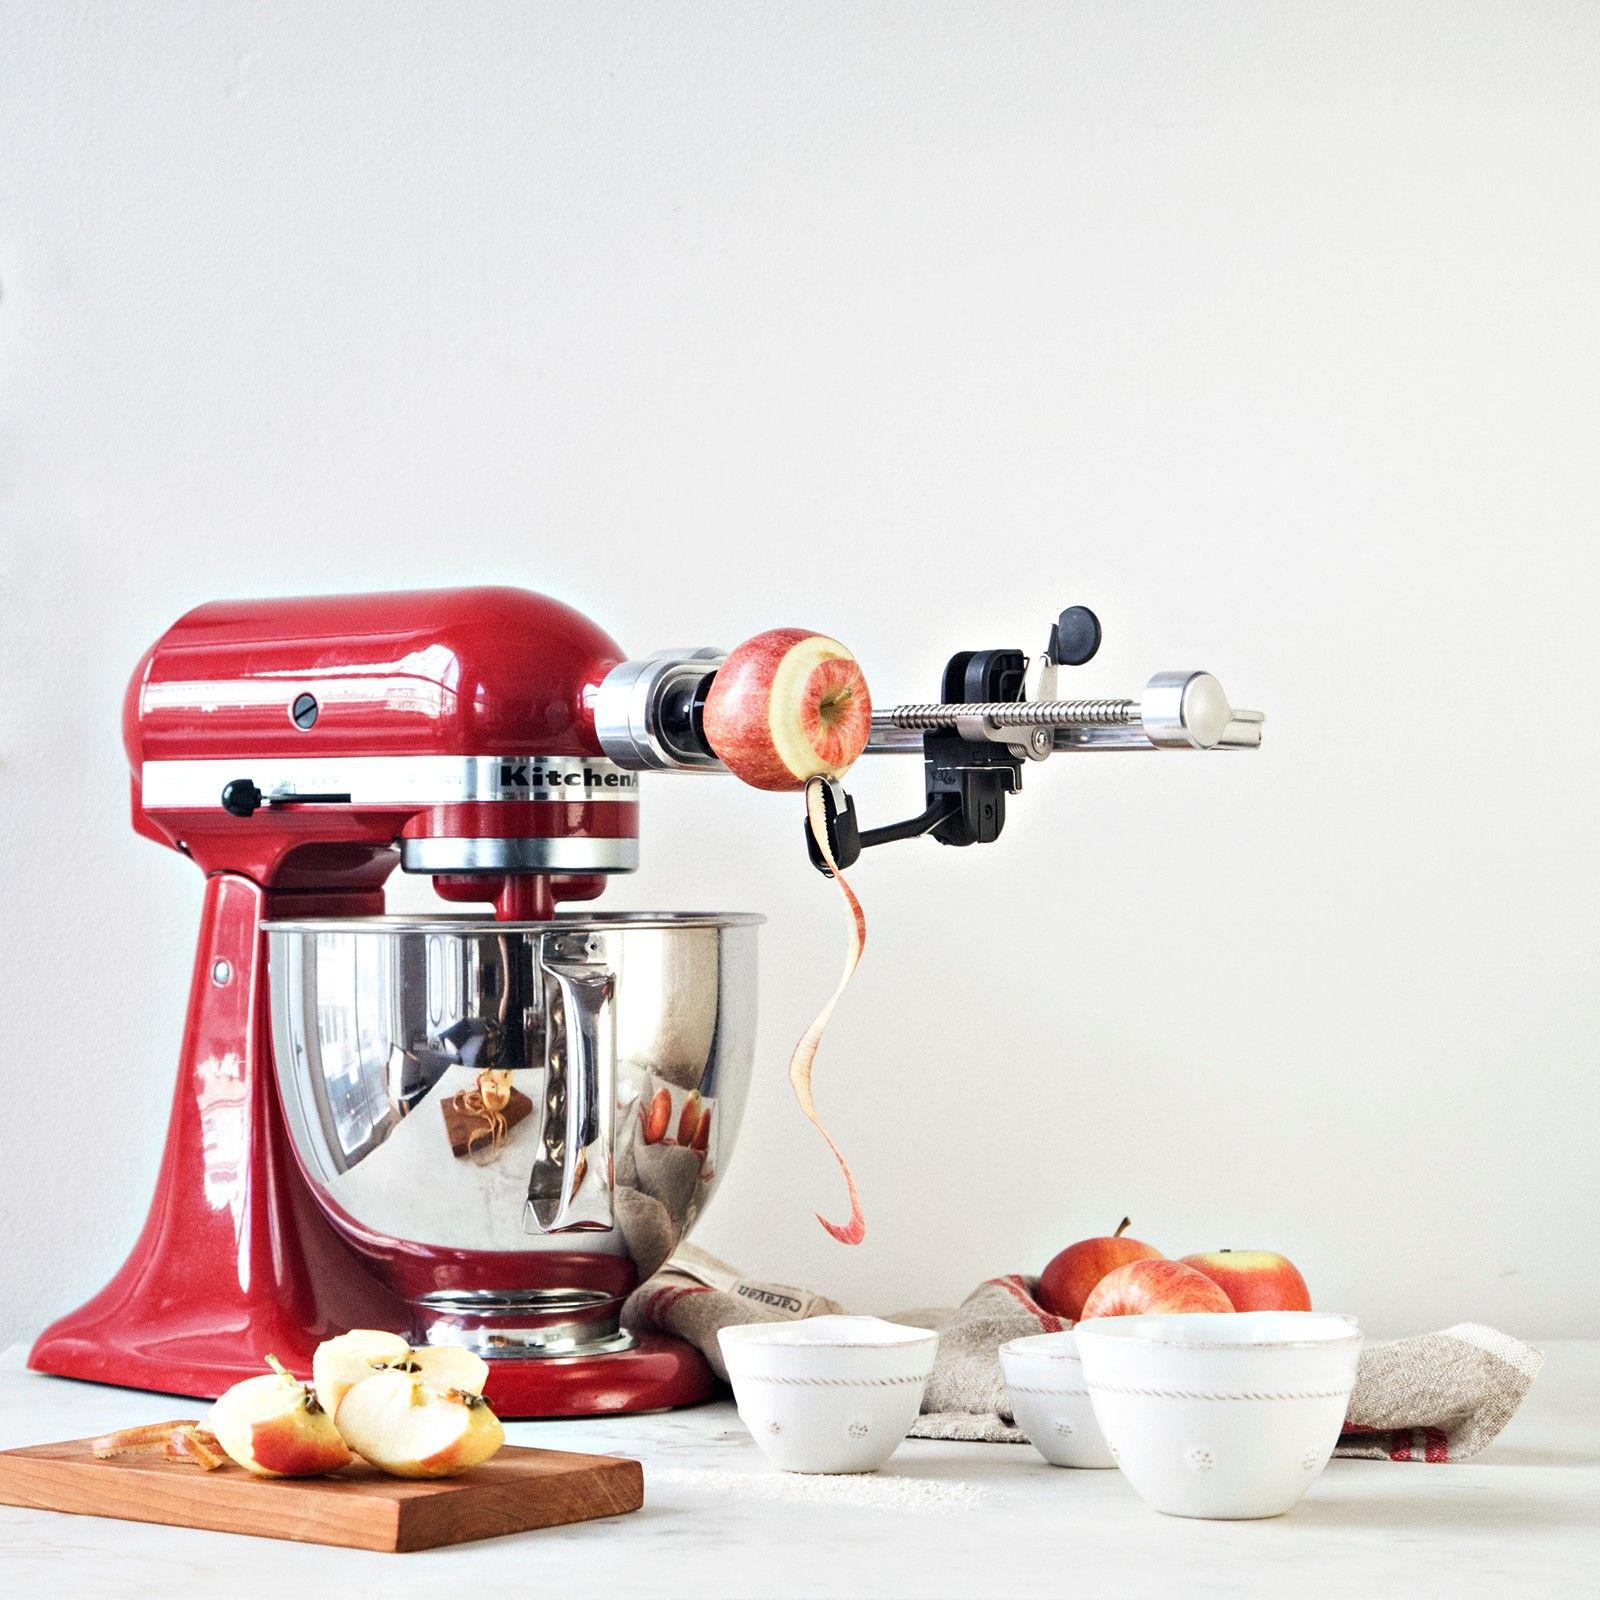 Artisan series 5 qt tilthead stand mixer by kitchenaid